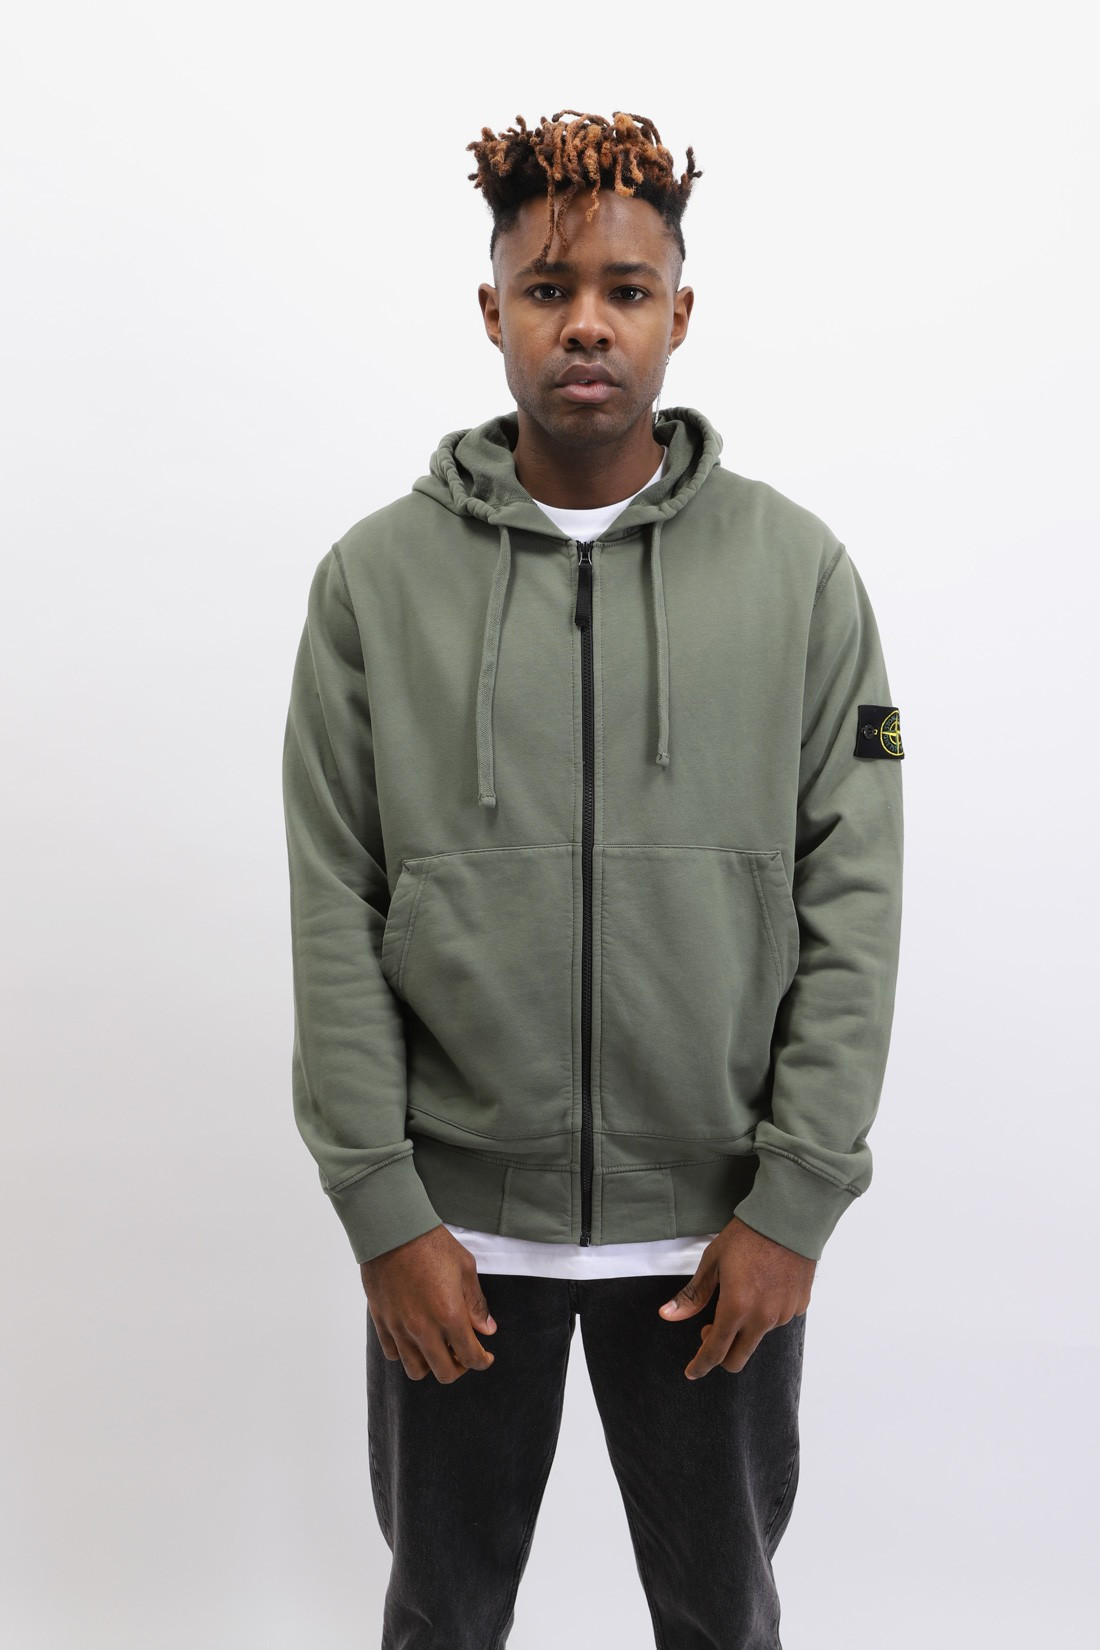 STONE ISLAND / 64251 hooded zip sweater v0058 Verde oliva